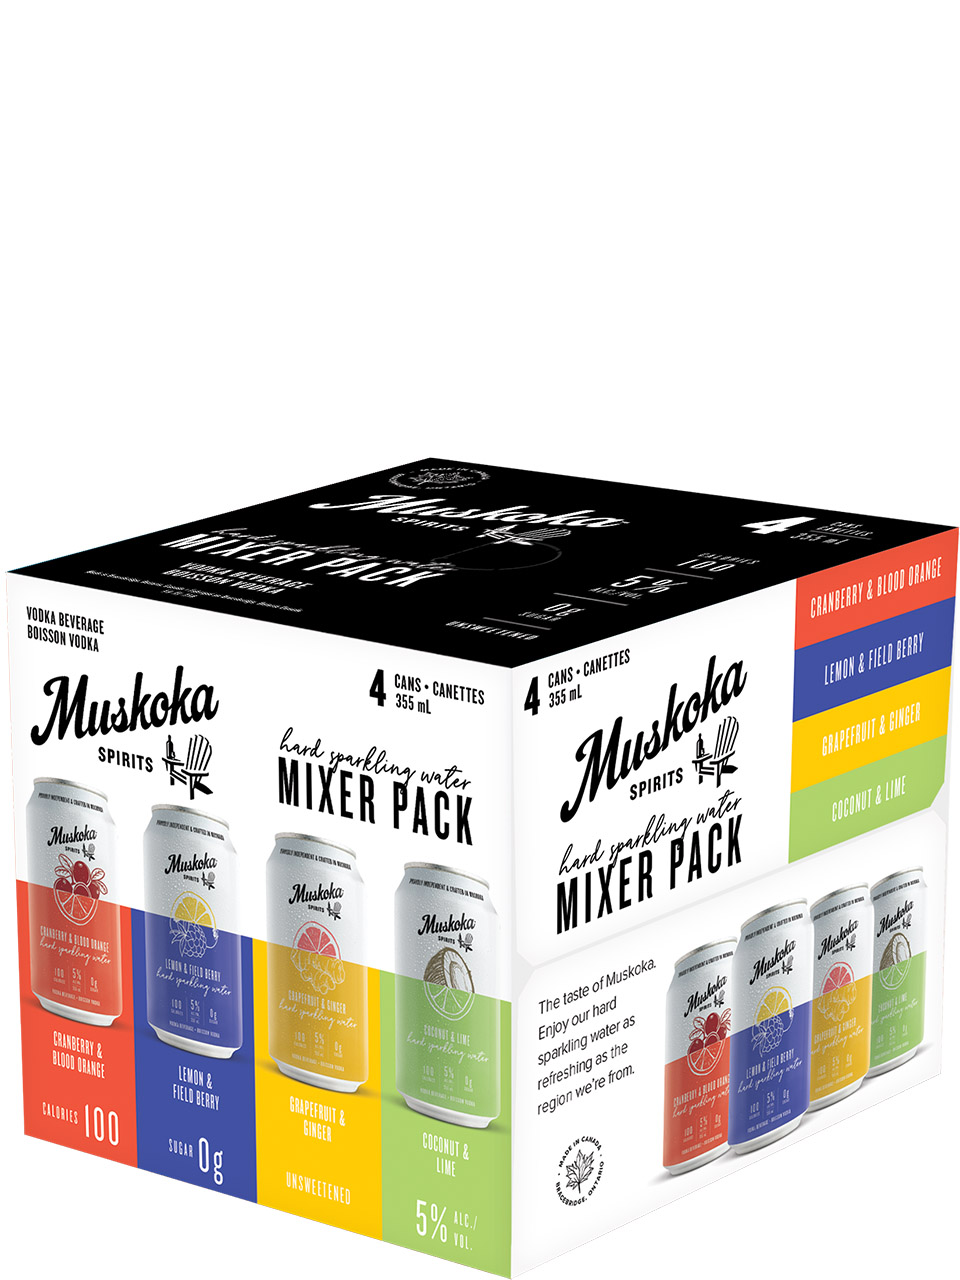 Muskoka Spirits Hard Sparkling Water Mix Pack 4pk